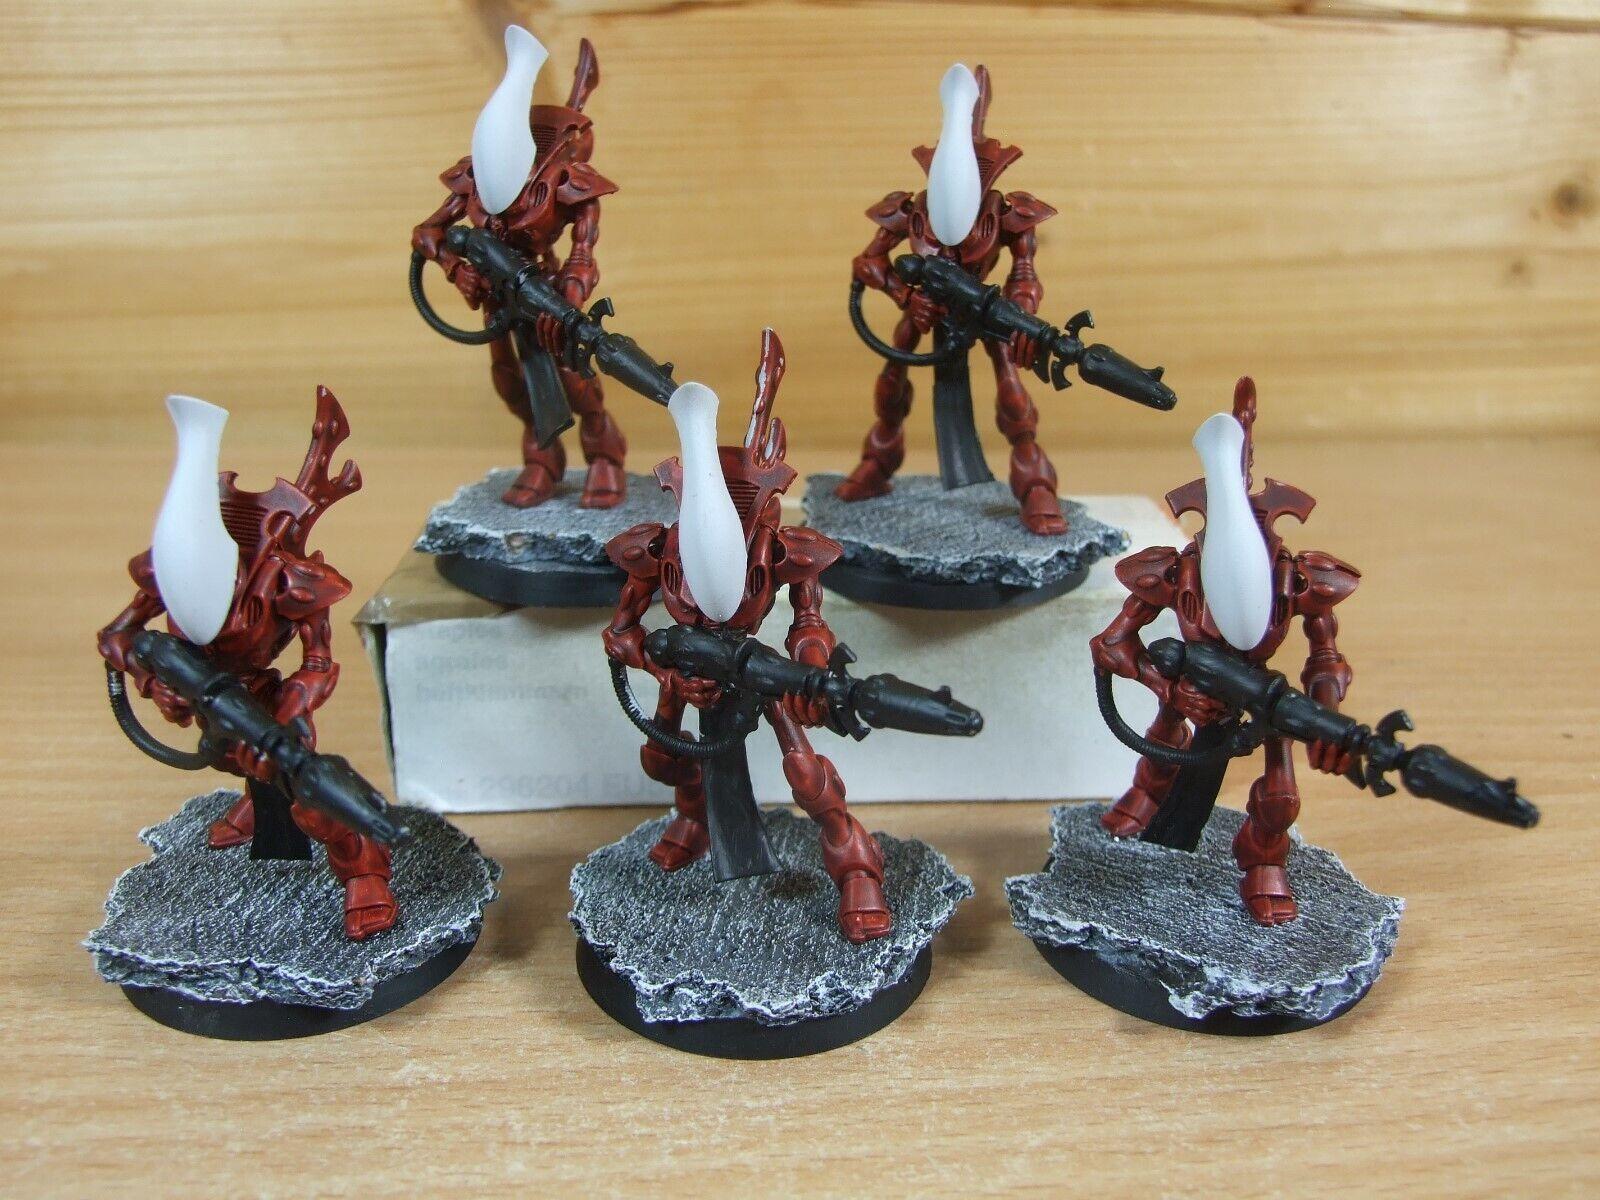 5 plastica WARHAMMER eldar Wraithguard dipinto (1249)